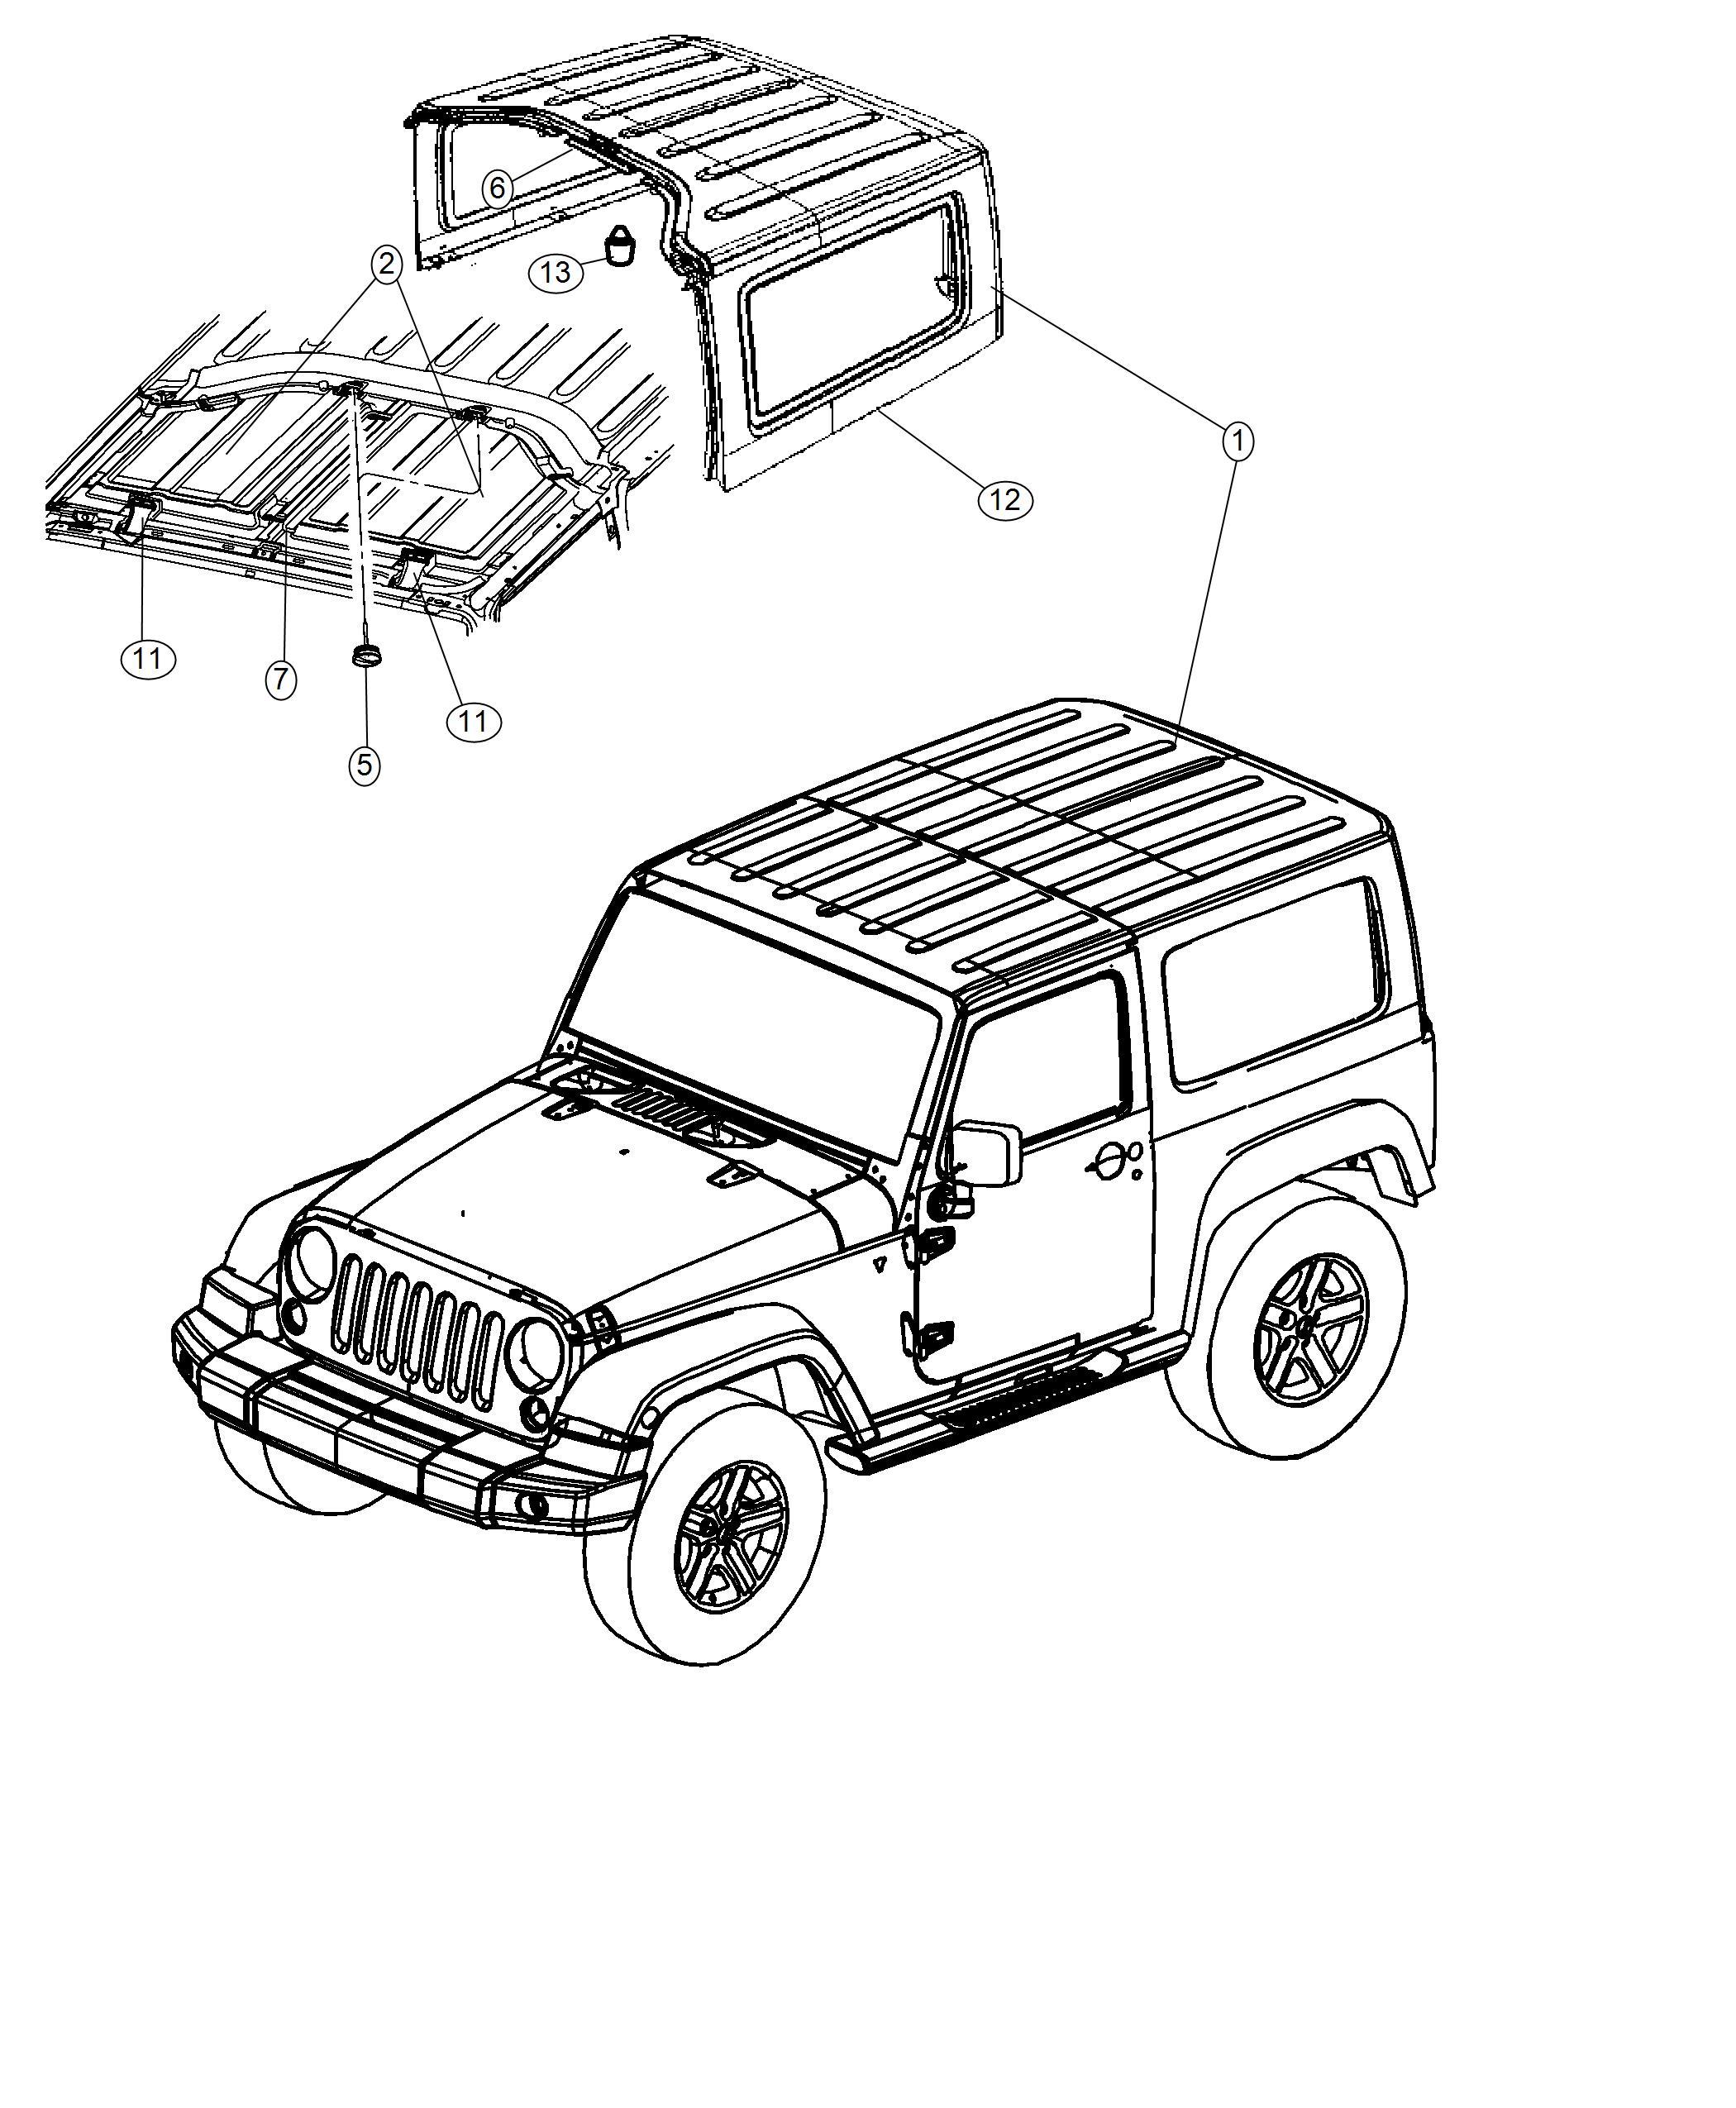 2018 Jeep Seal. Targa top. [body color hard top], [black 3